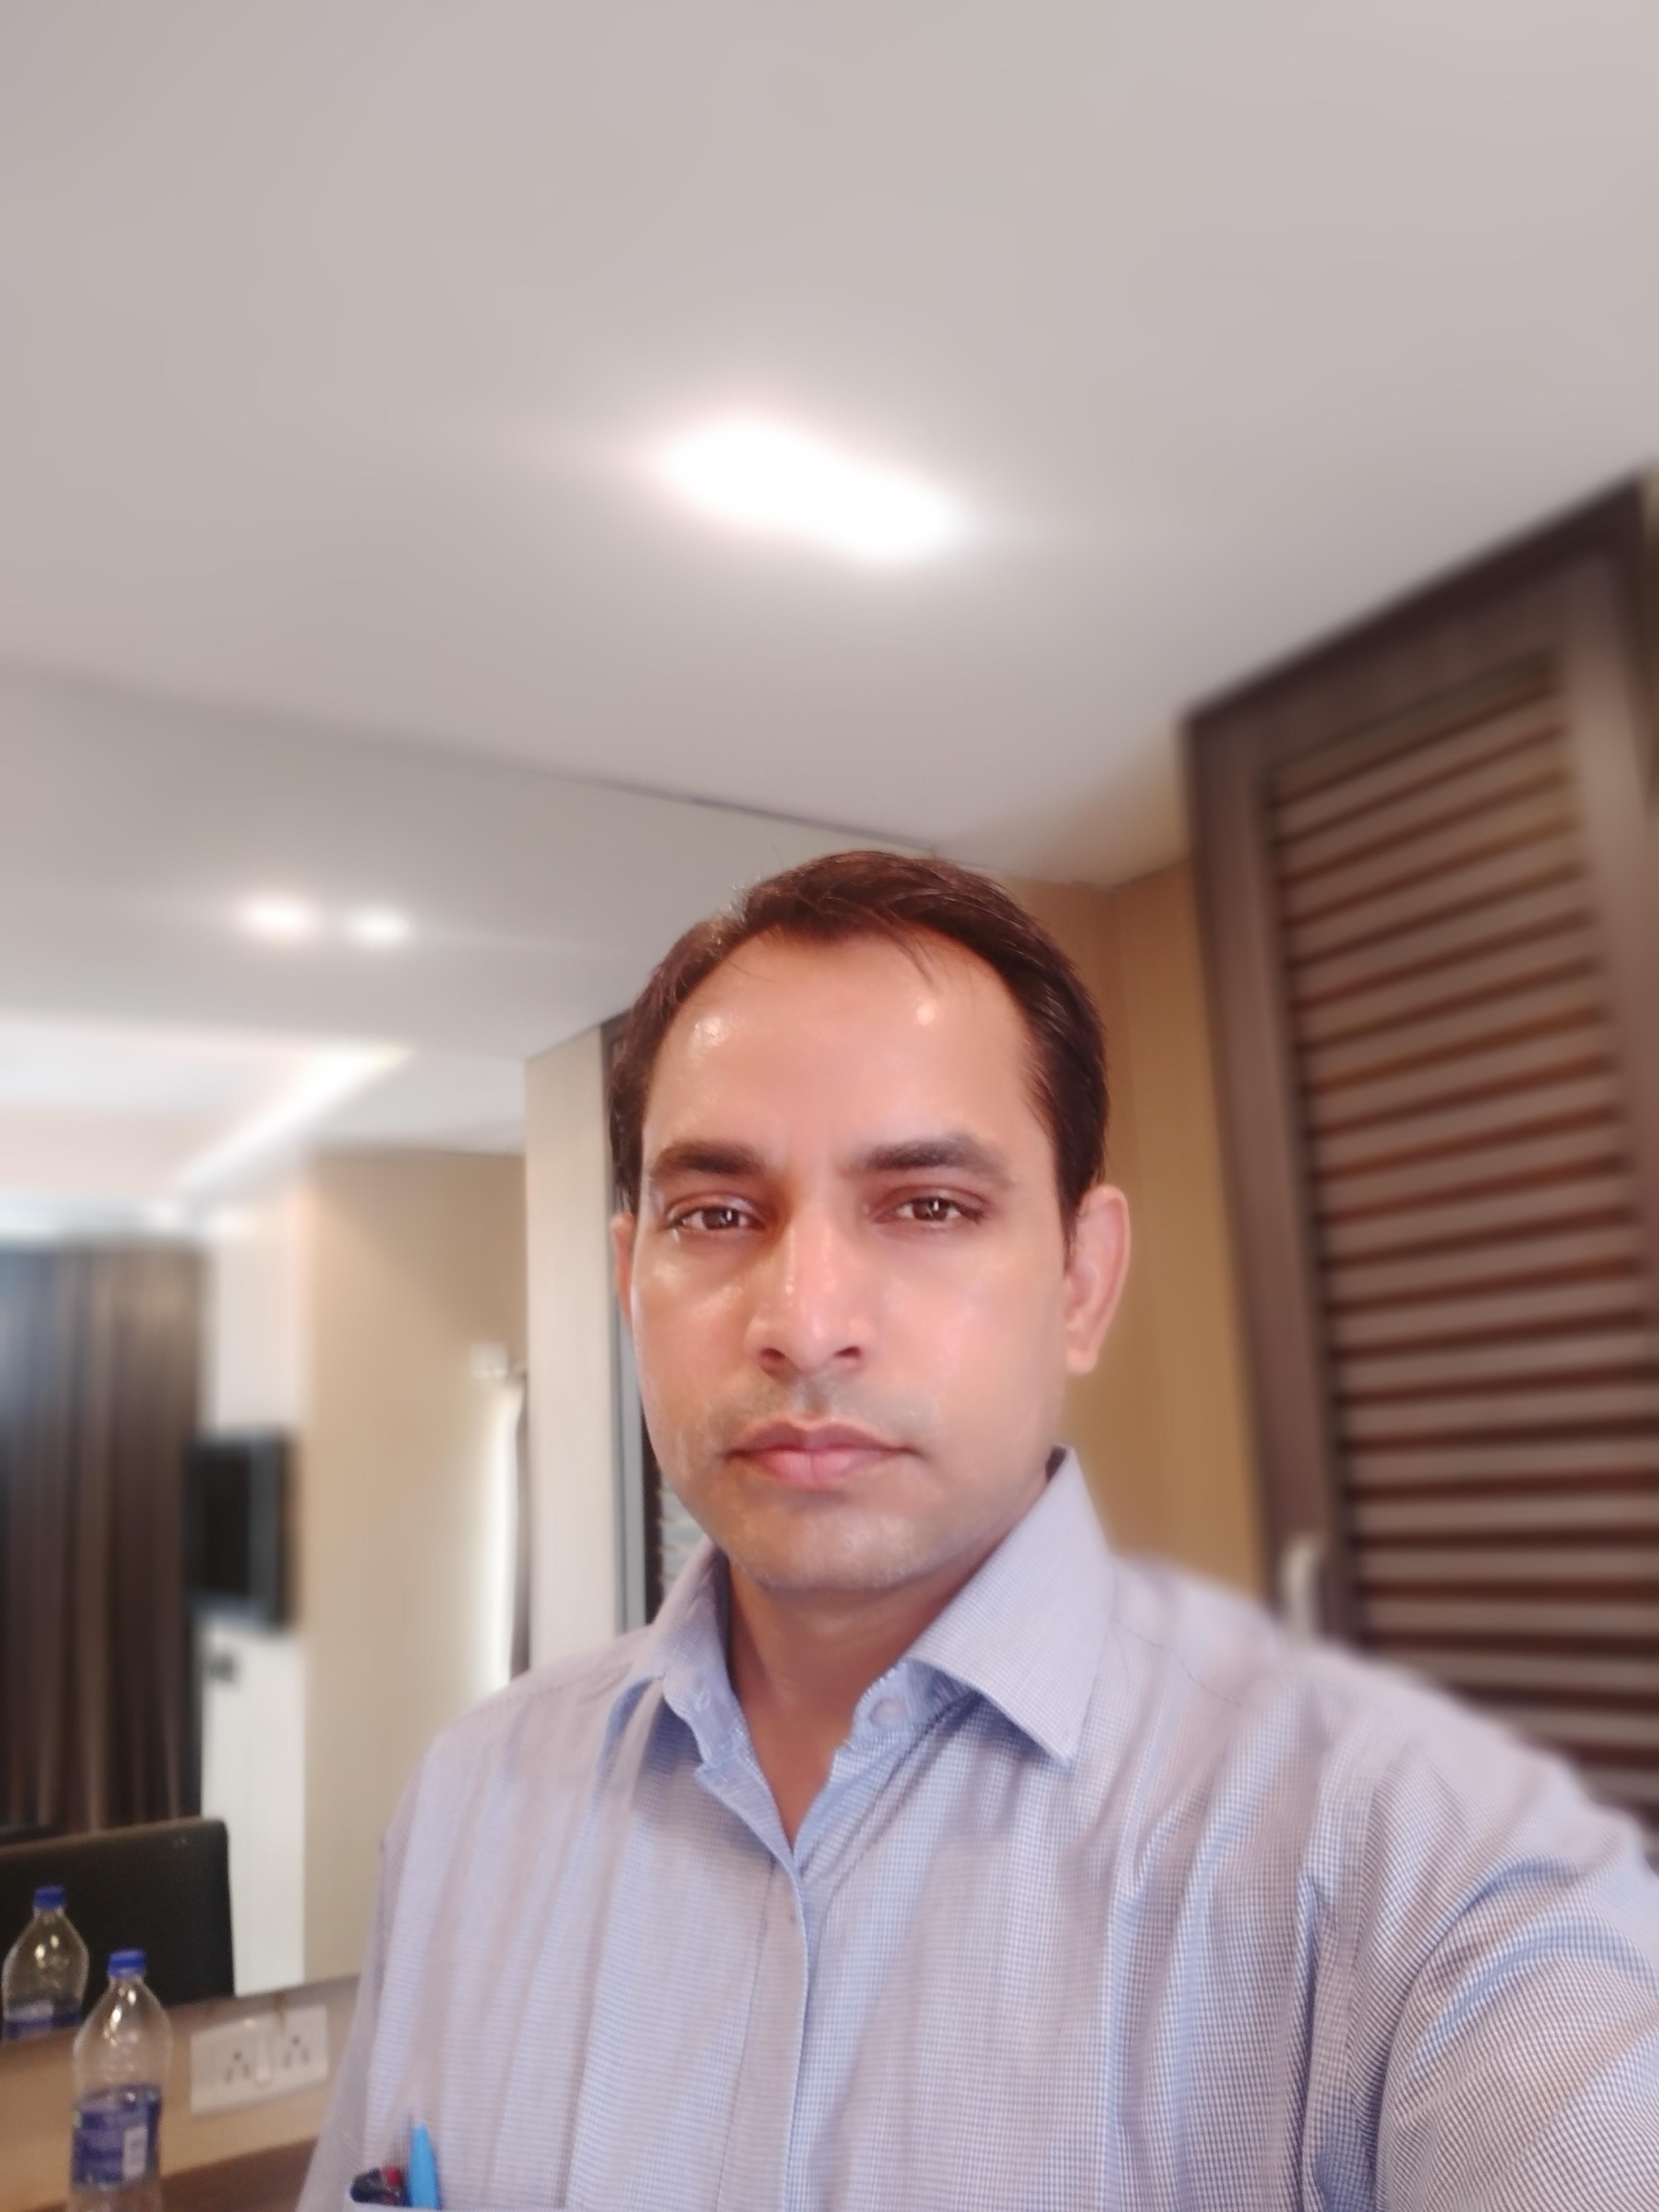 Dr Virbhan Balai